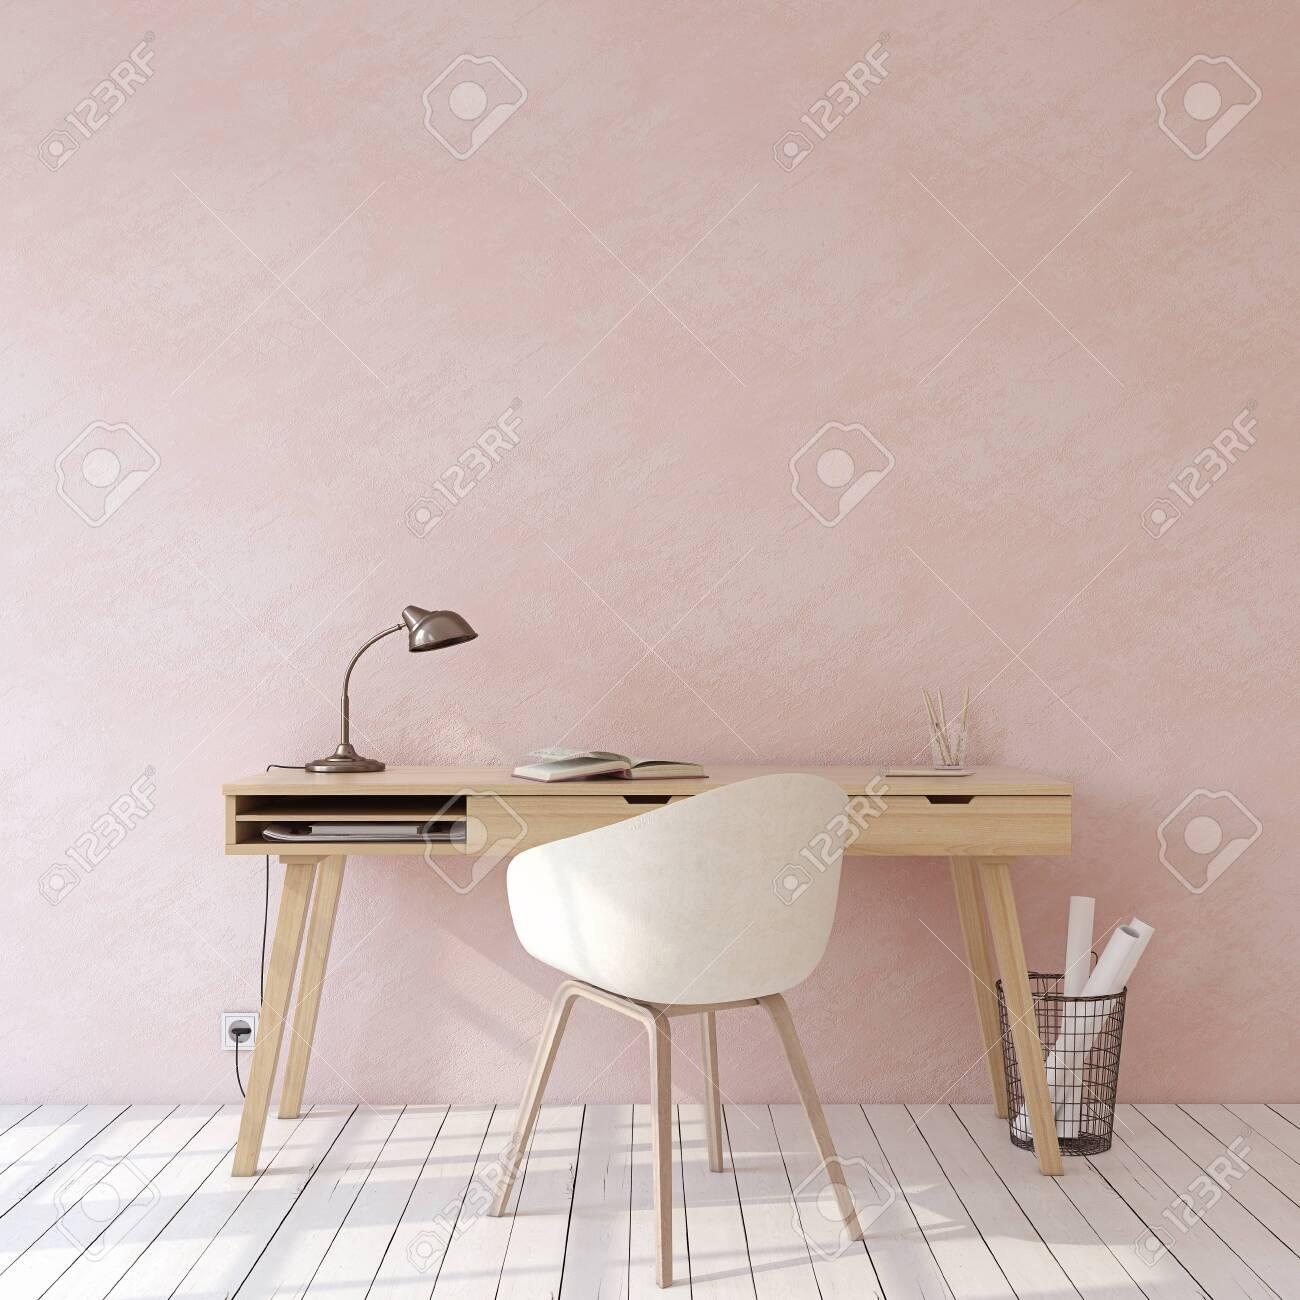 Home office. Interior mockup. Wooden desk near empty pink wall. 3d render. - 121679403